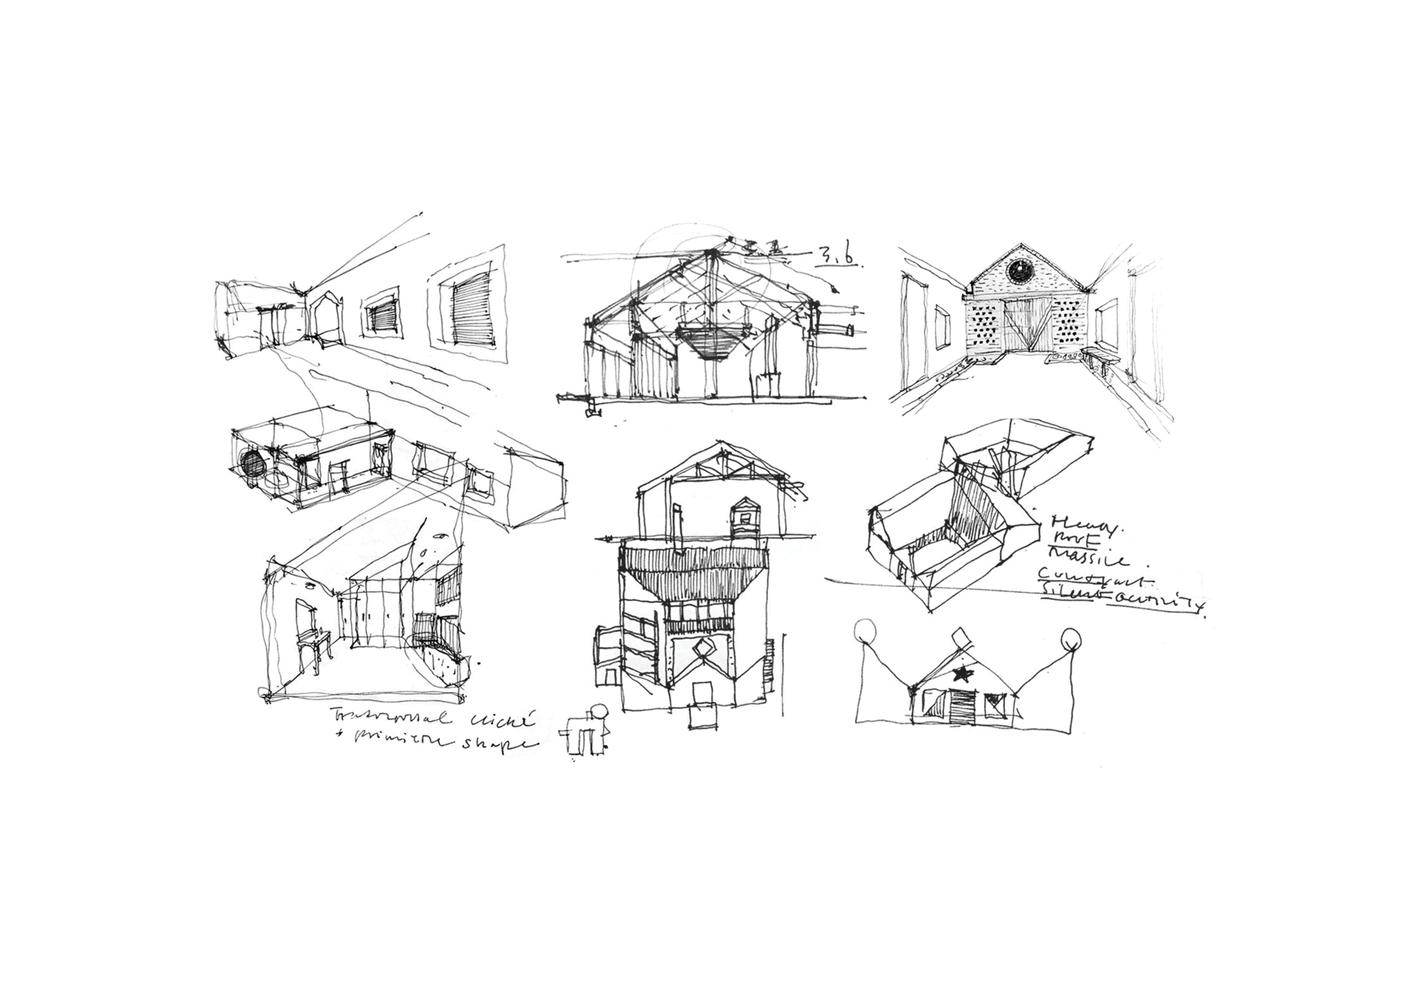 hight resolution of  house digeut jip aoa architects